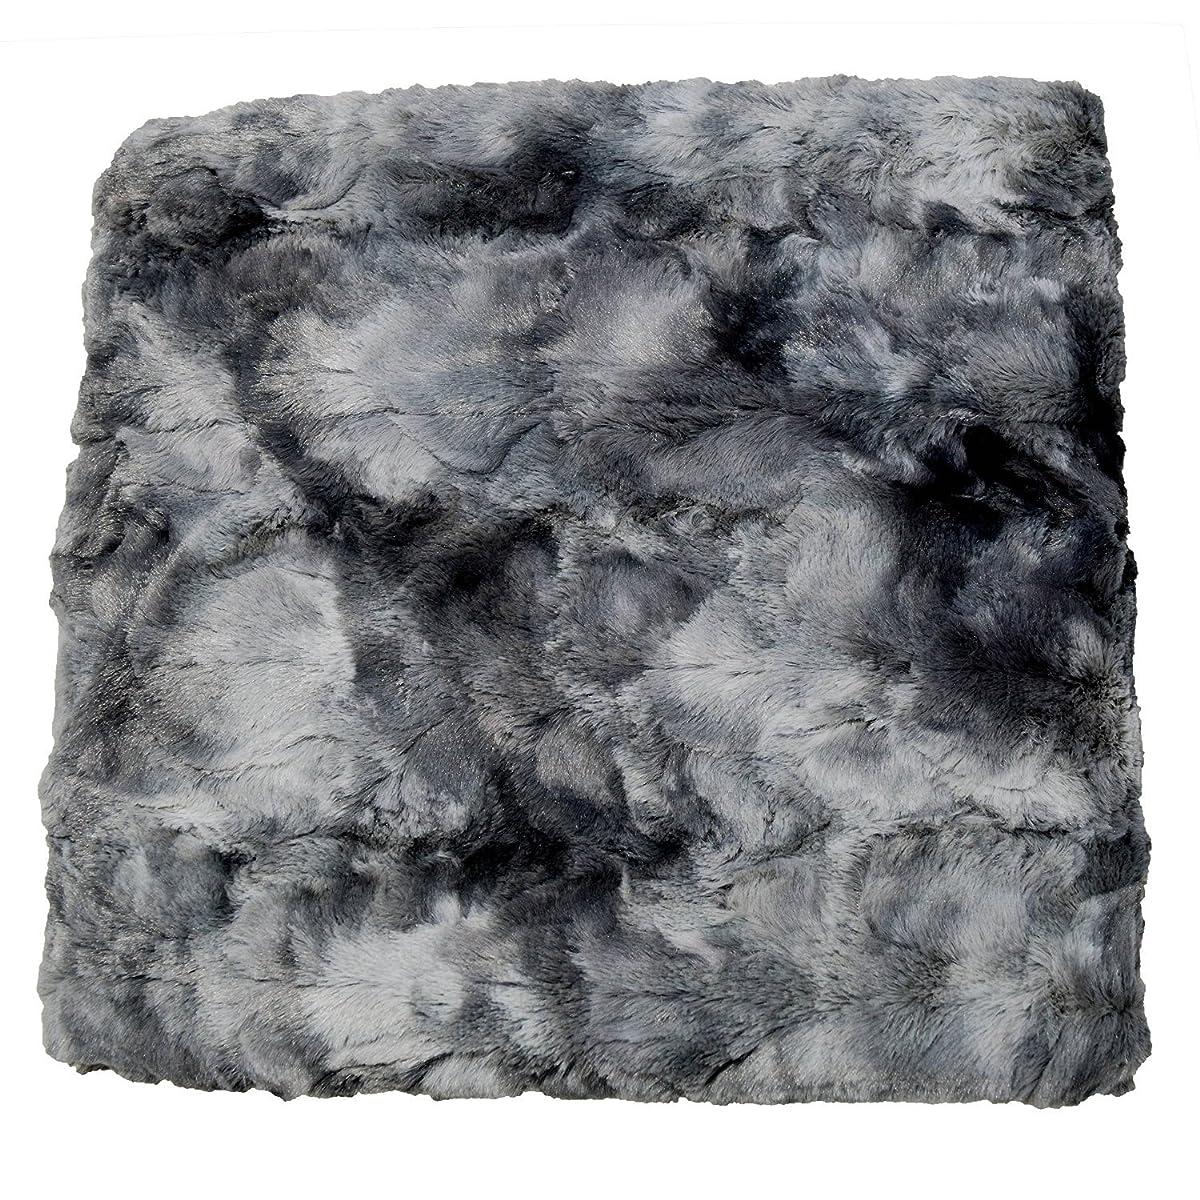 Chanasya Super Soft Fuzzy Fur Faux Fur Cozy Warm Fluffy Beautiful Color Variatiion Print Plush Sherpa Dark Gray Fur Throw Blanket -Charcoal Gray Waivy Fur Pattern